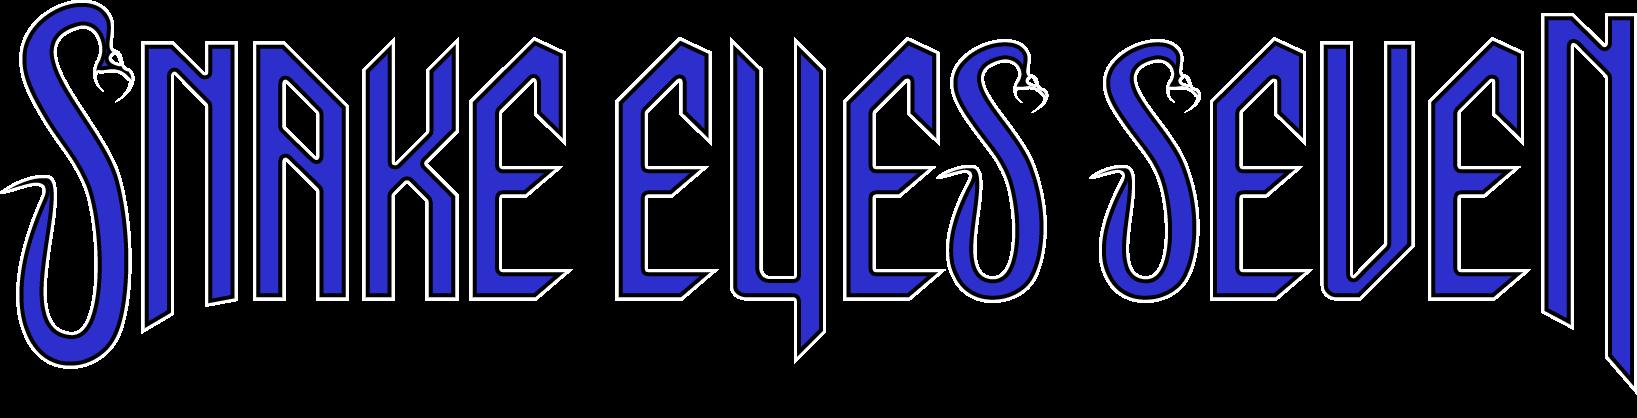 Snake Eyes Seven - Logo